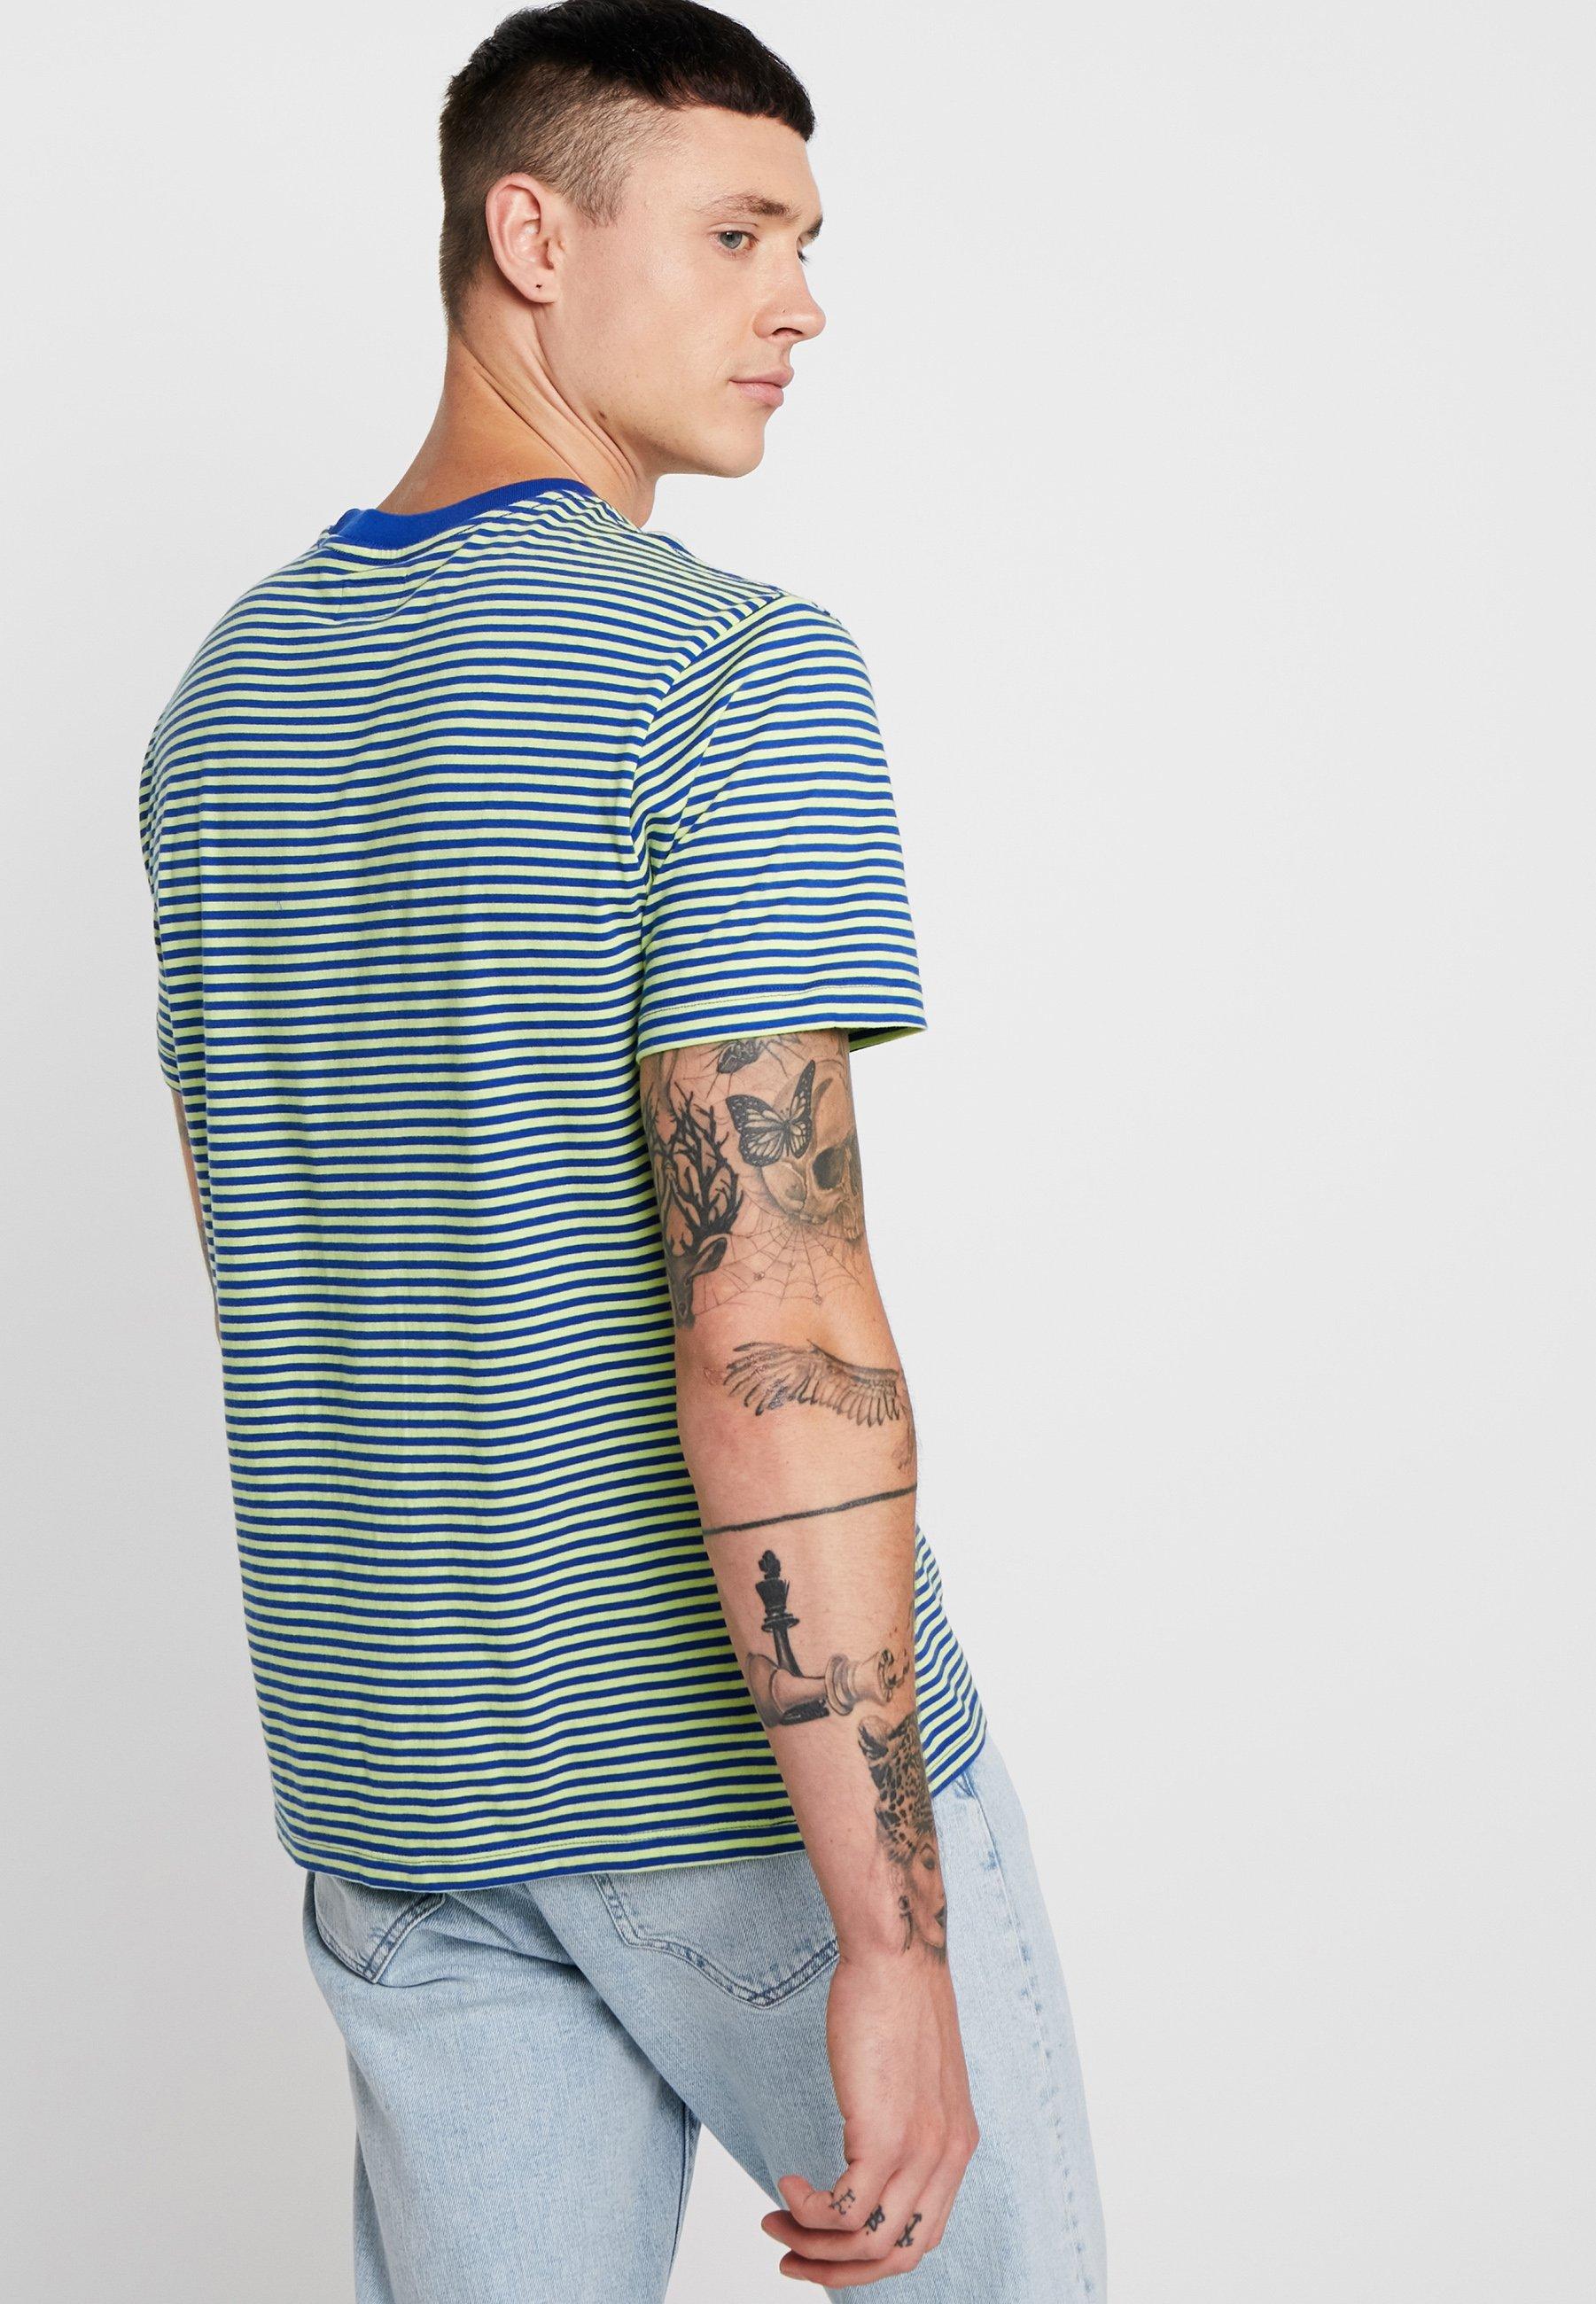 Apex multi Clothing Imprimé Blue Obey Surf shirt TeeT KcJlF1